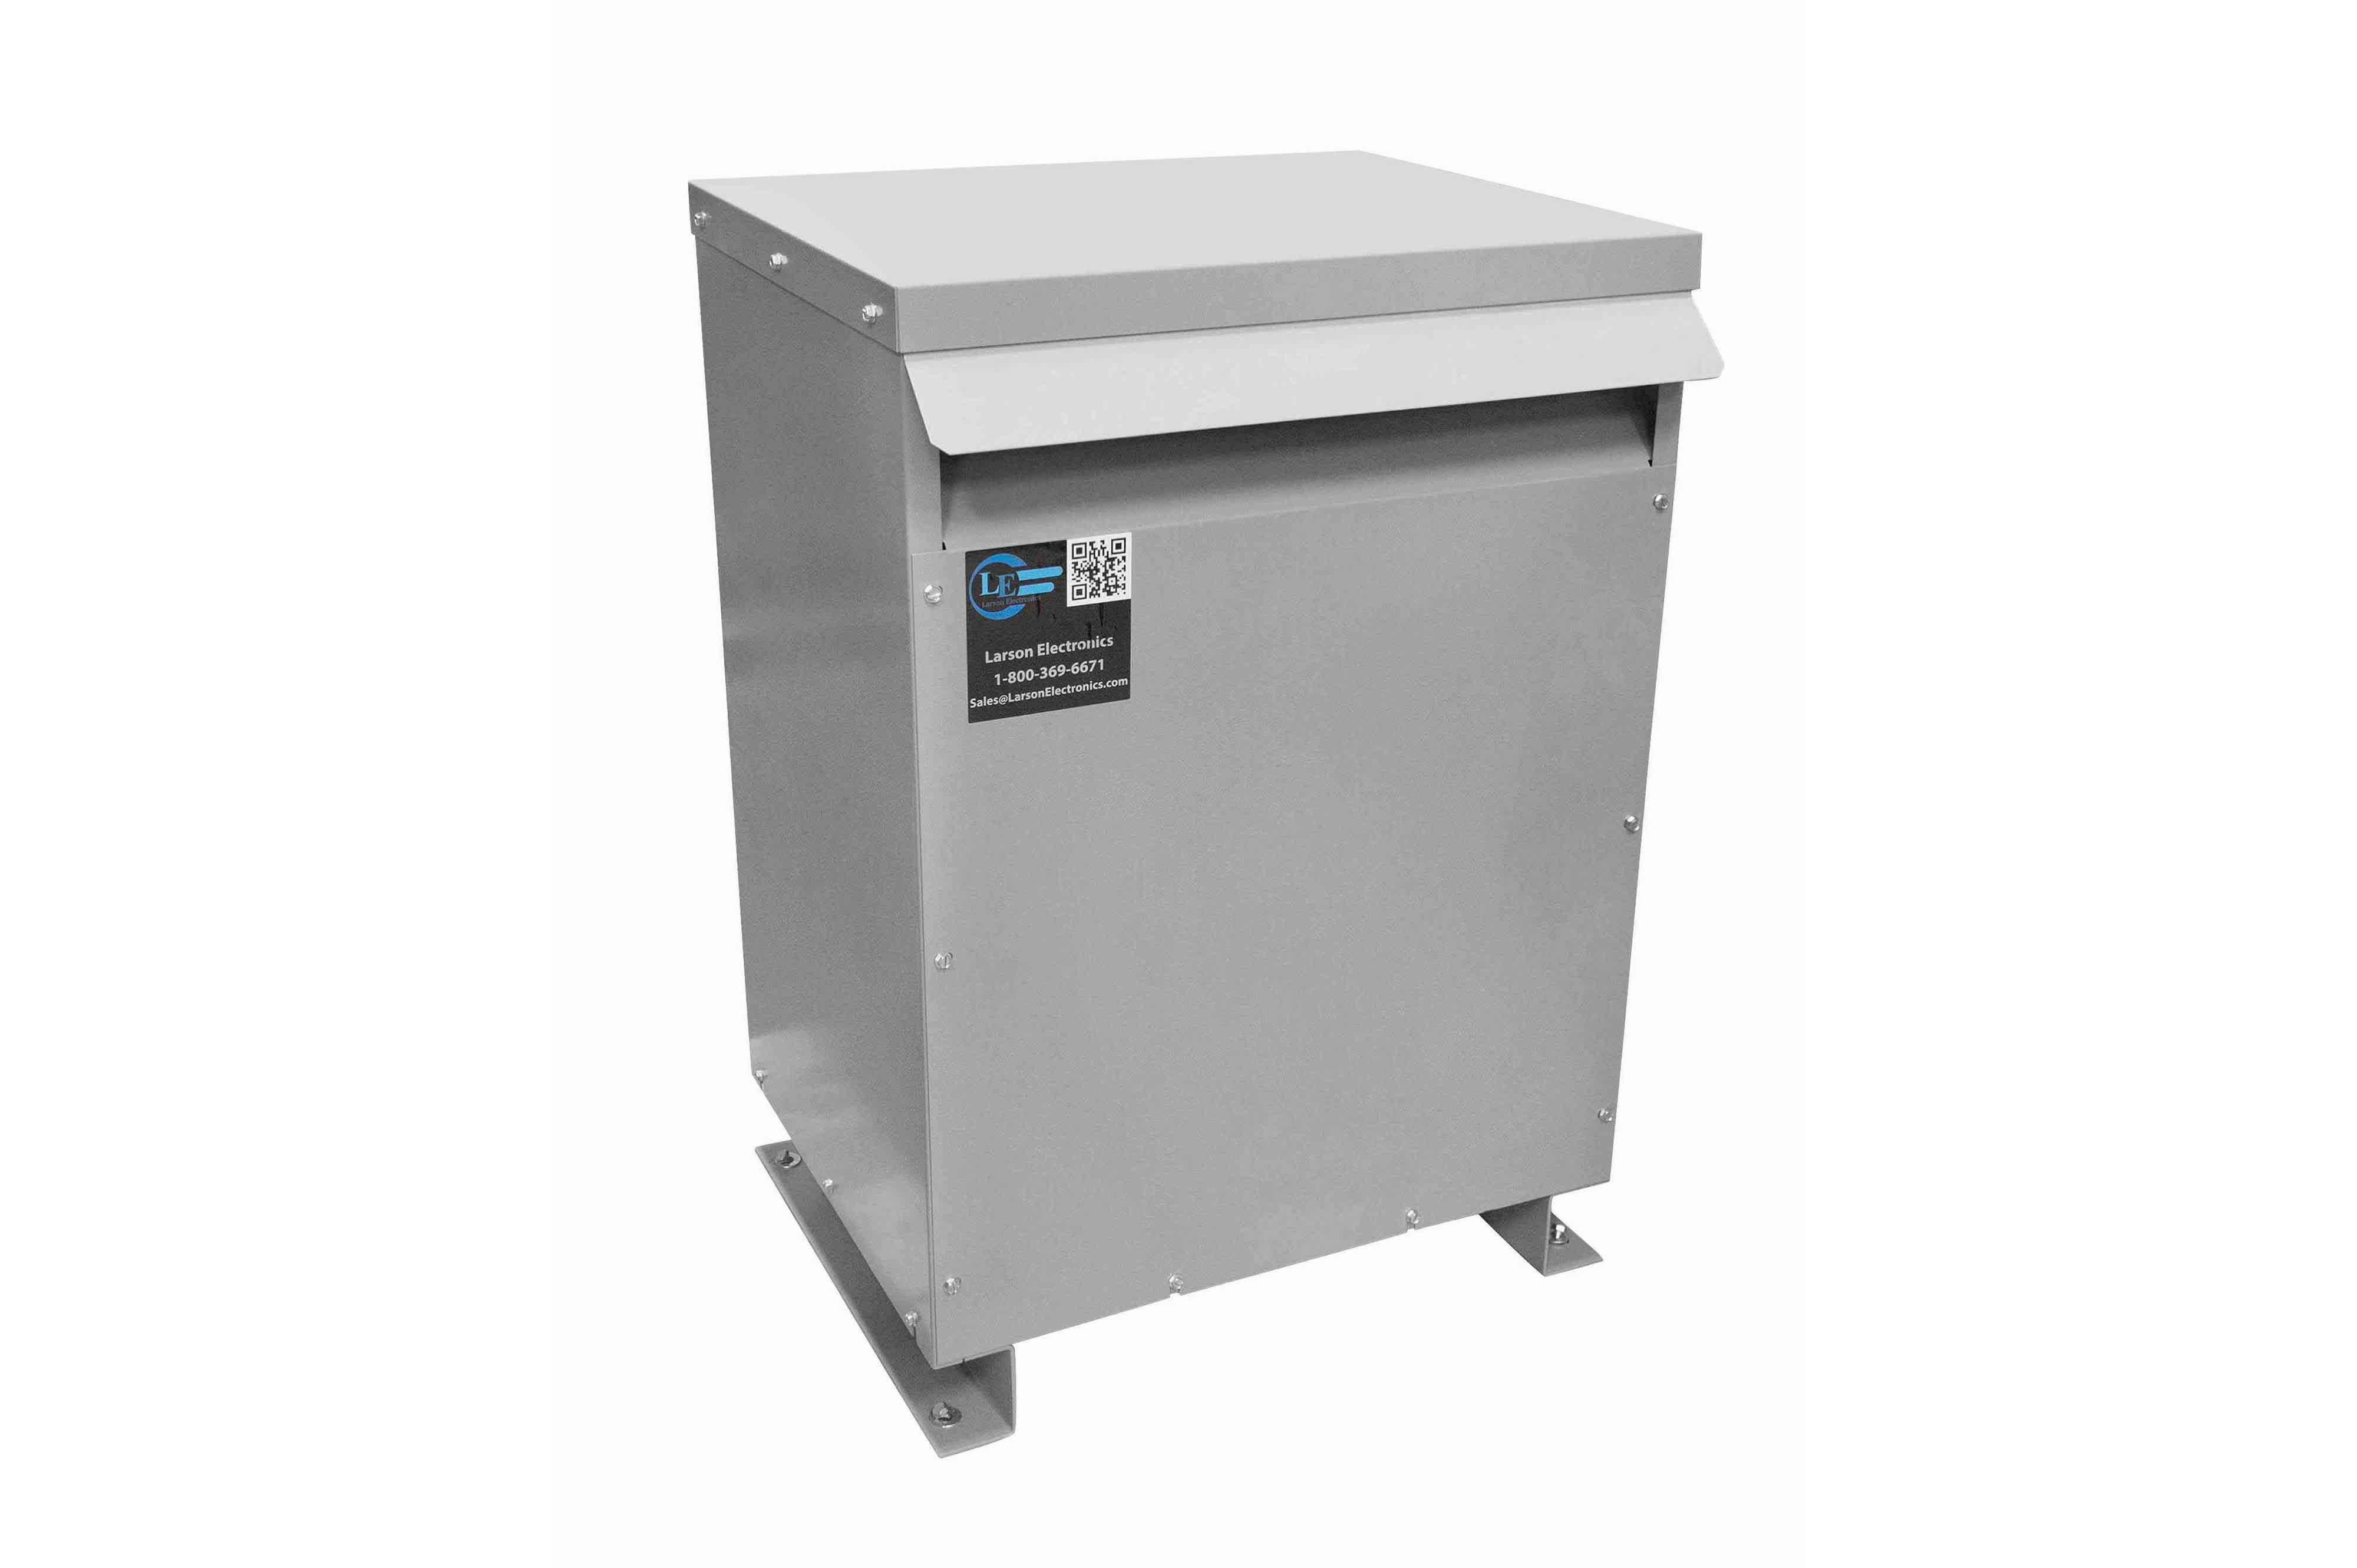 600 kVA 3PH Isolation Transformer, 600V Wye Primary, 415V Delta Secondary, N3R, Ventilated, 60 Hz